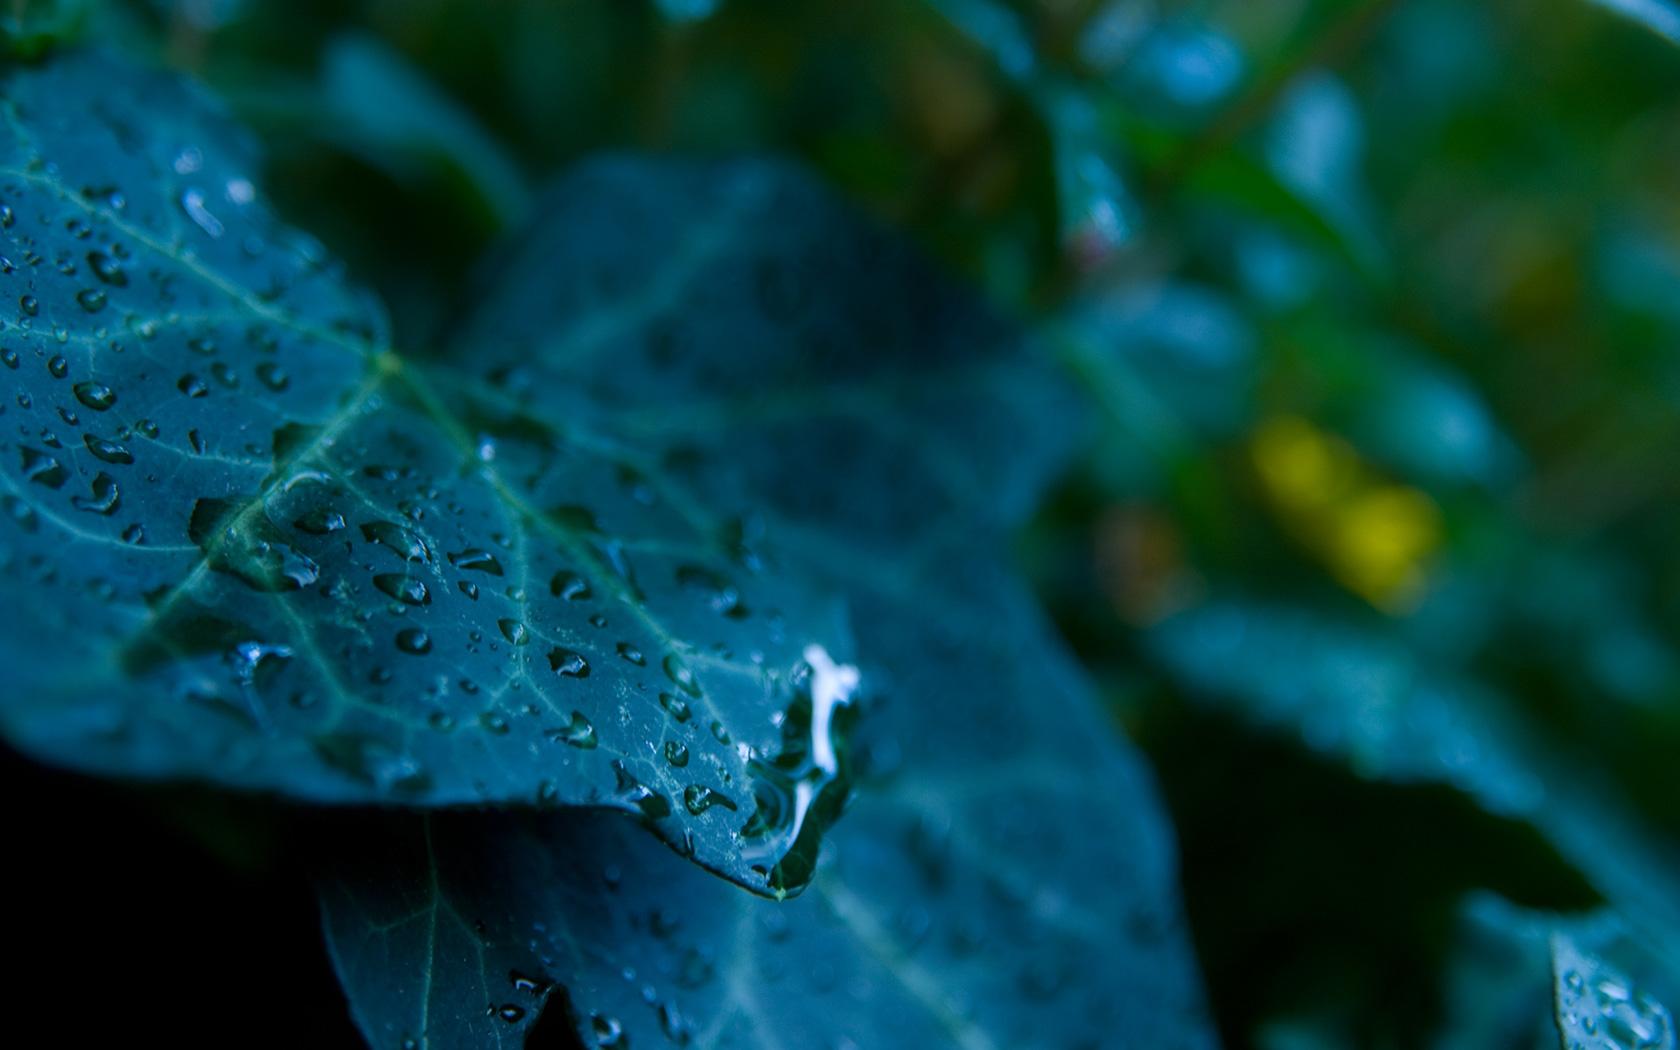 raindrops hd images